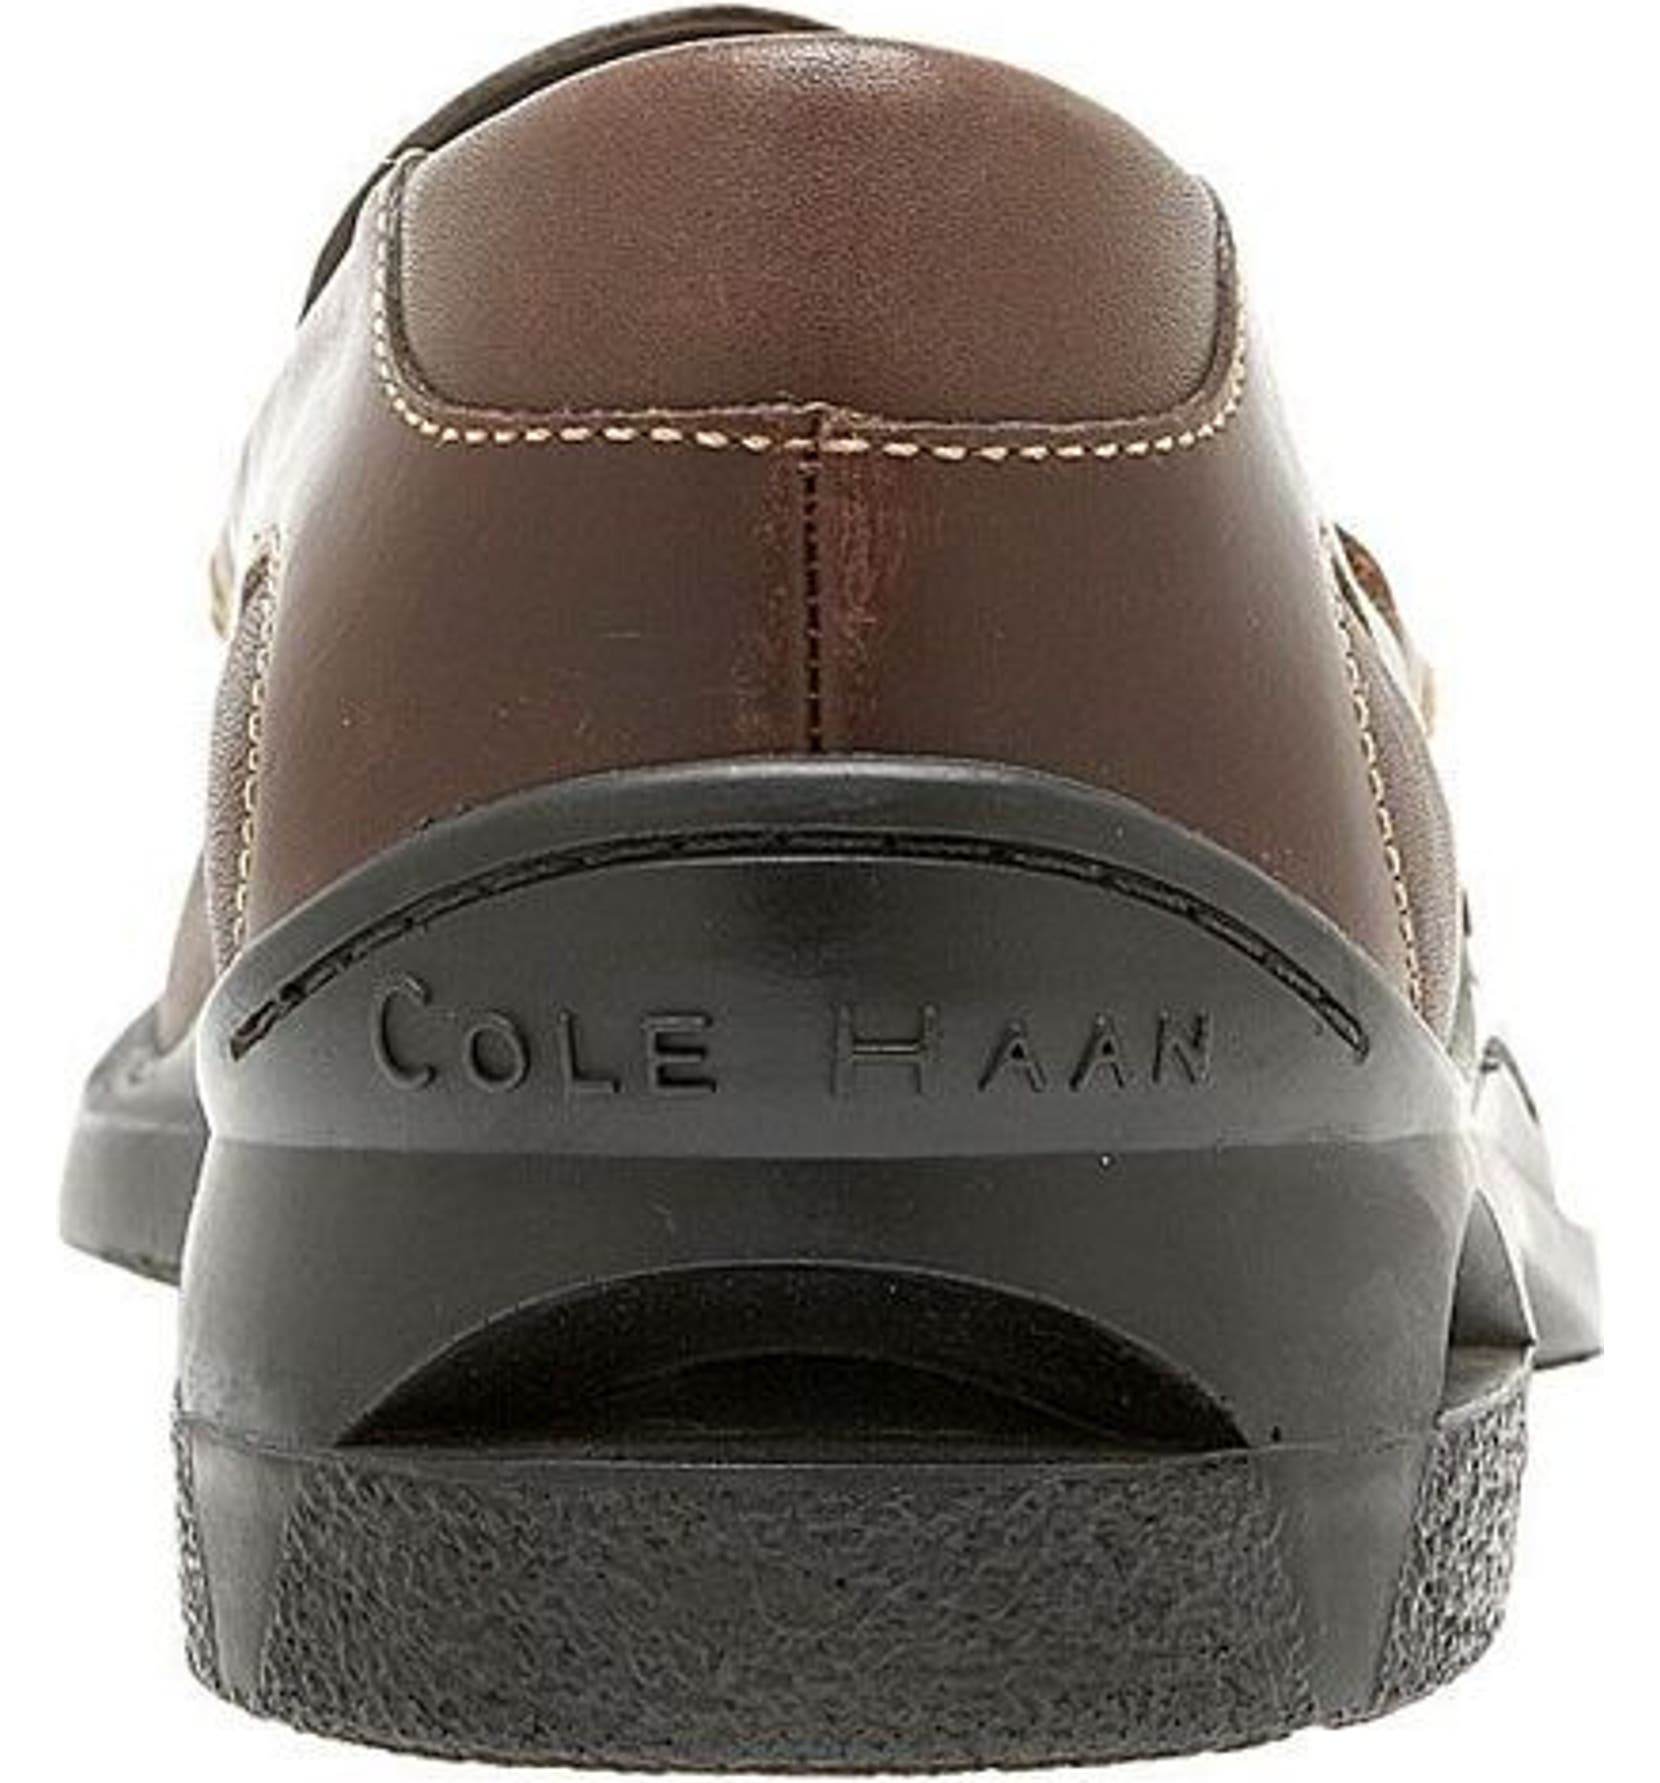 84131412f3a Cole Haan  Air Santa Barbara  Penny Loafer